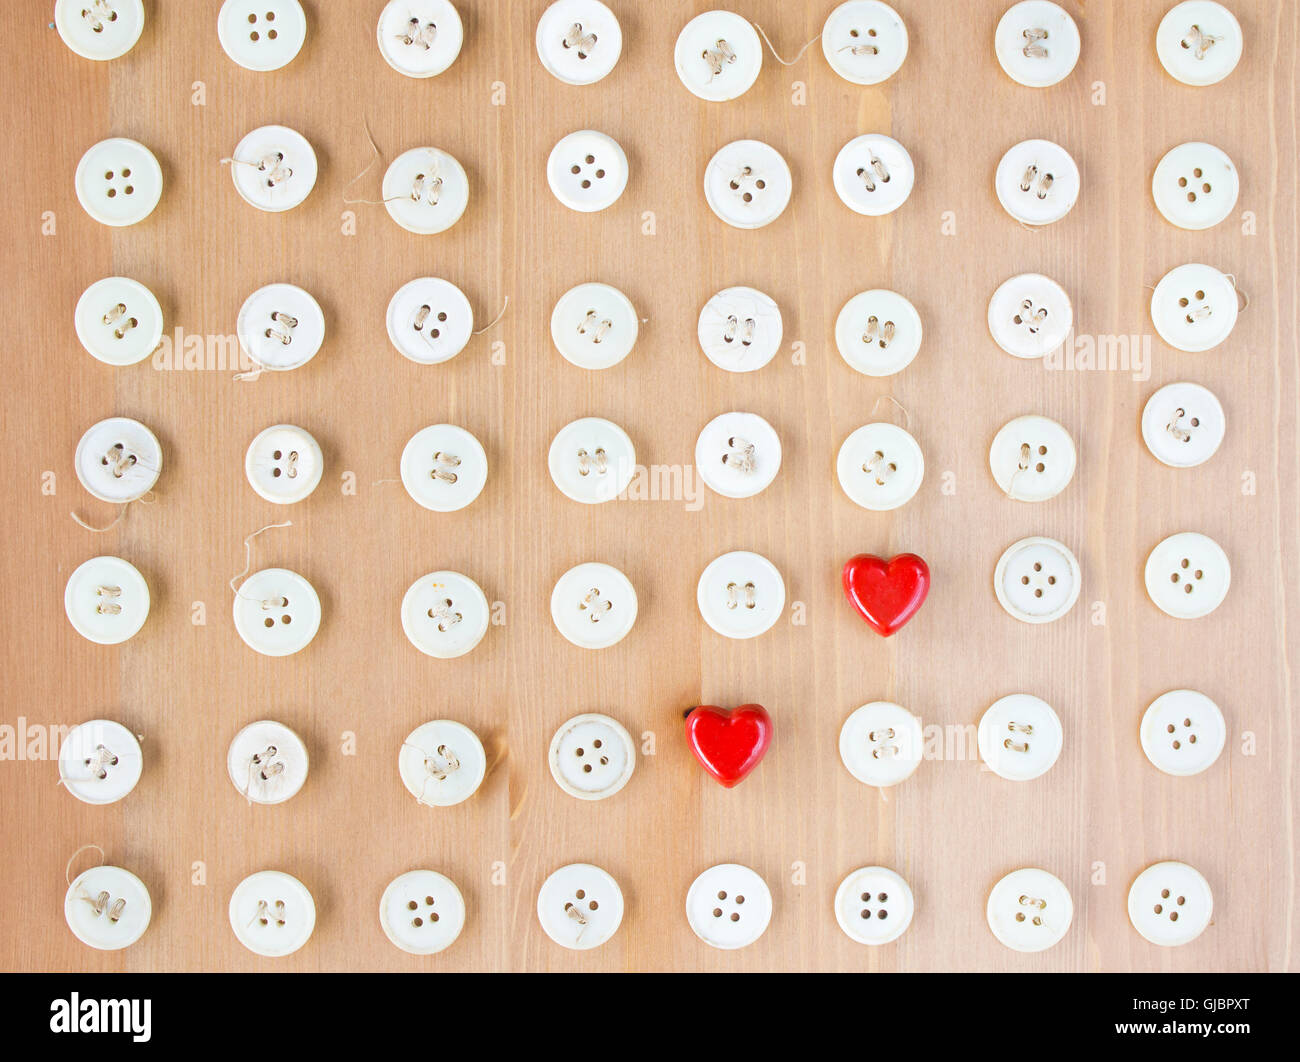 Buttons Wooden Table Button Stockfotos & Buttons Wooden Table Button ...